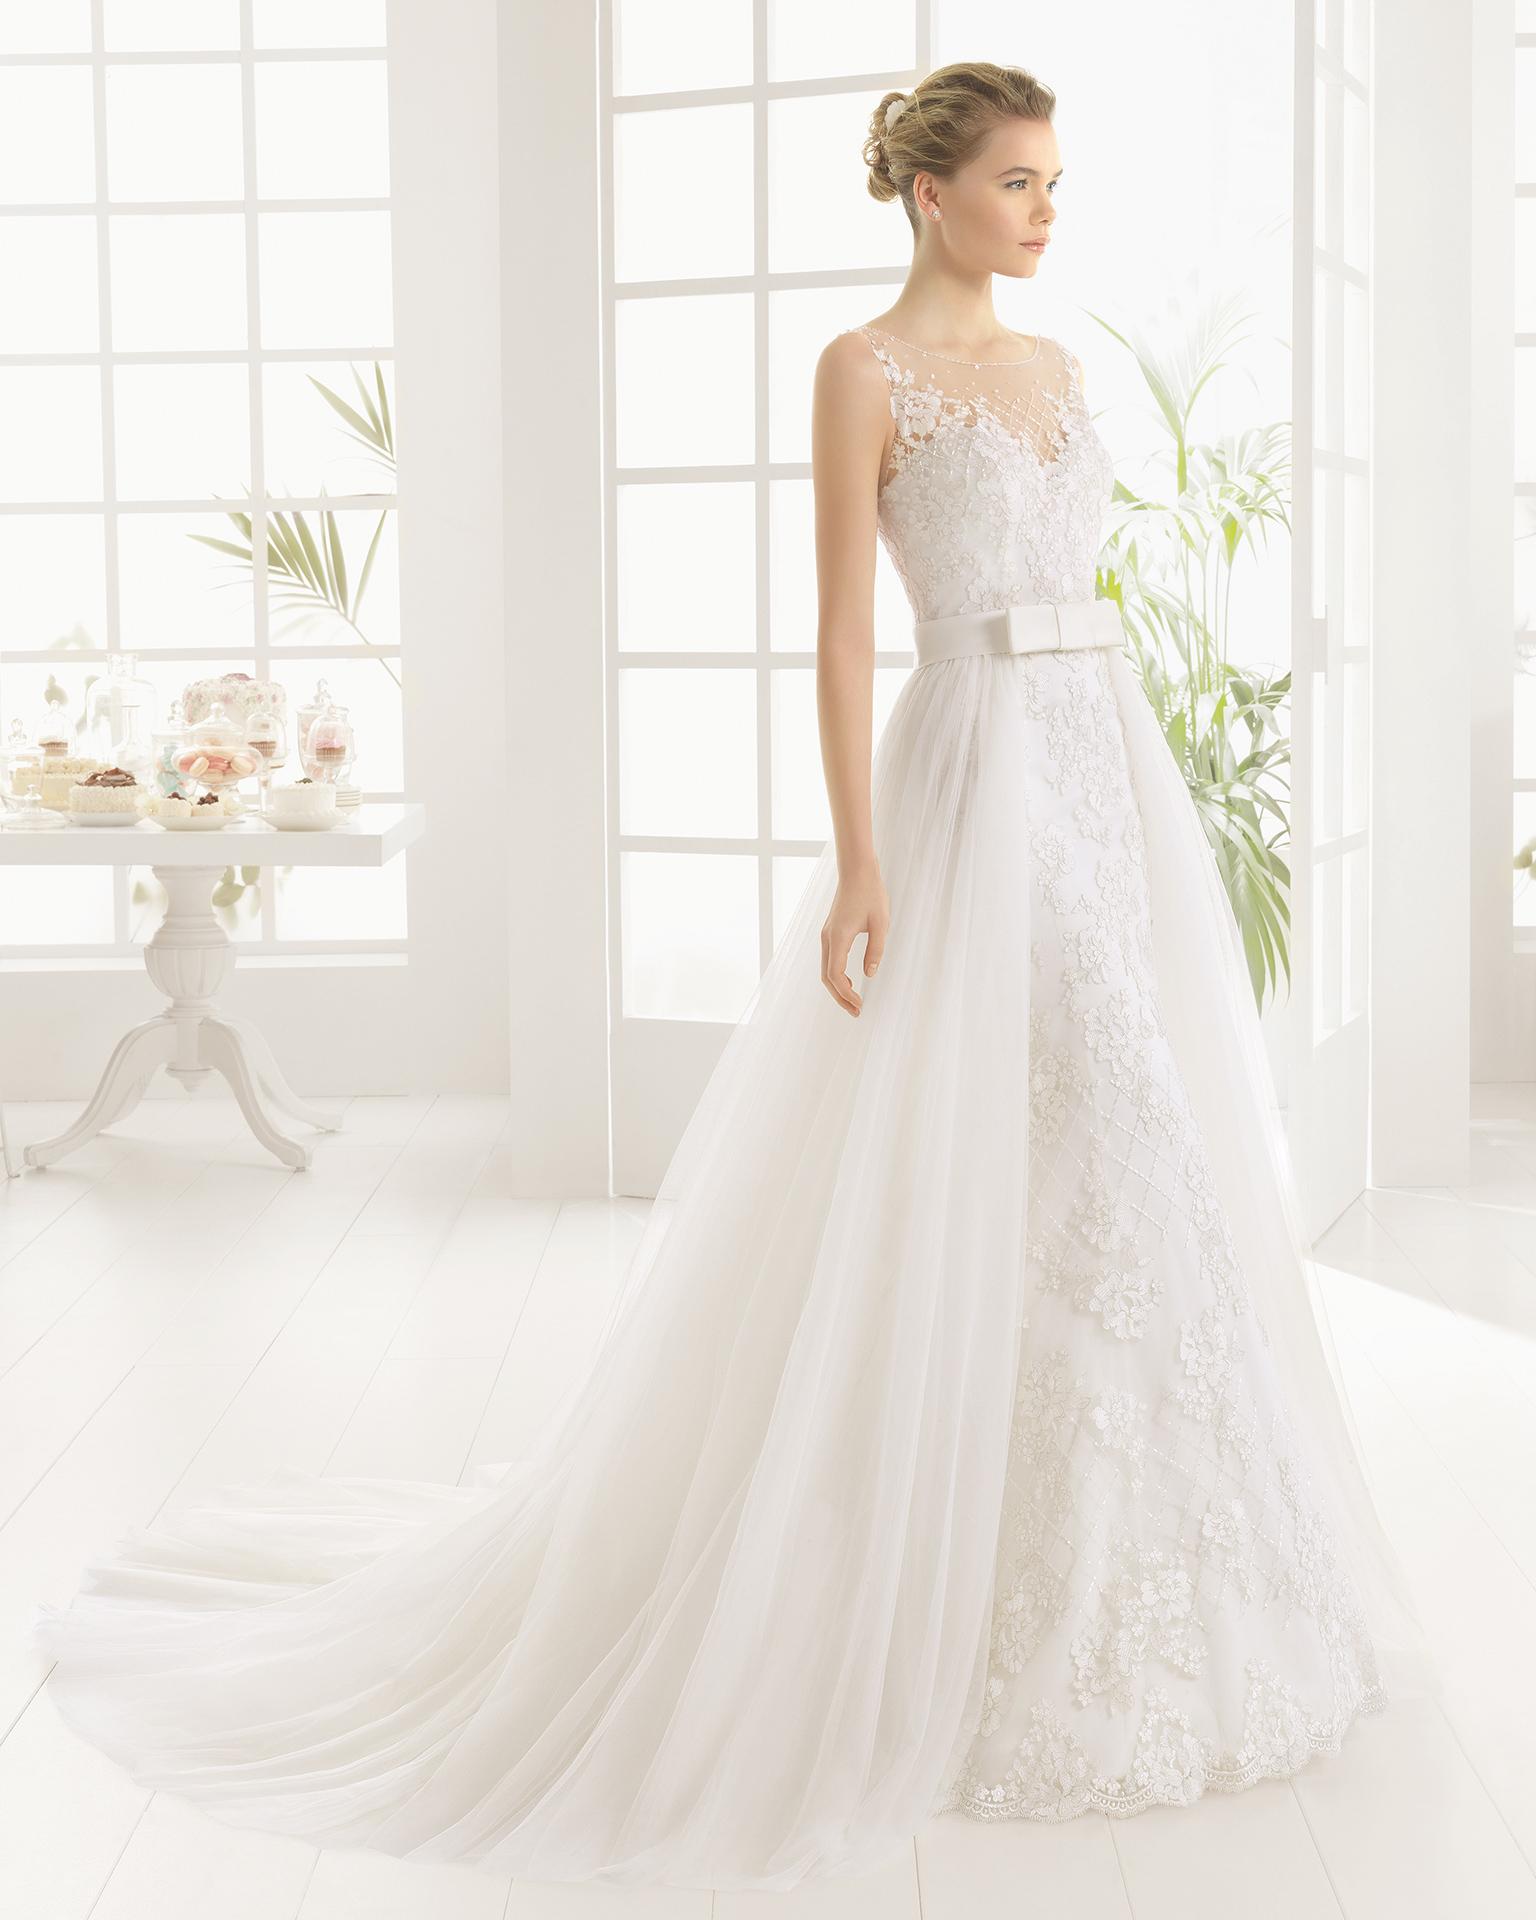 MARITZA beaded lace and tulle wedding dress.